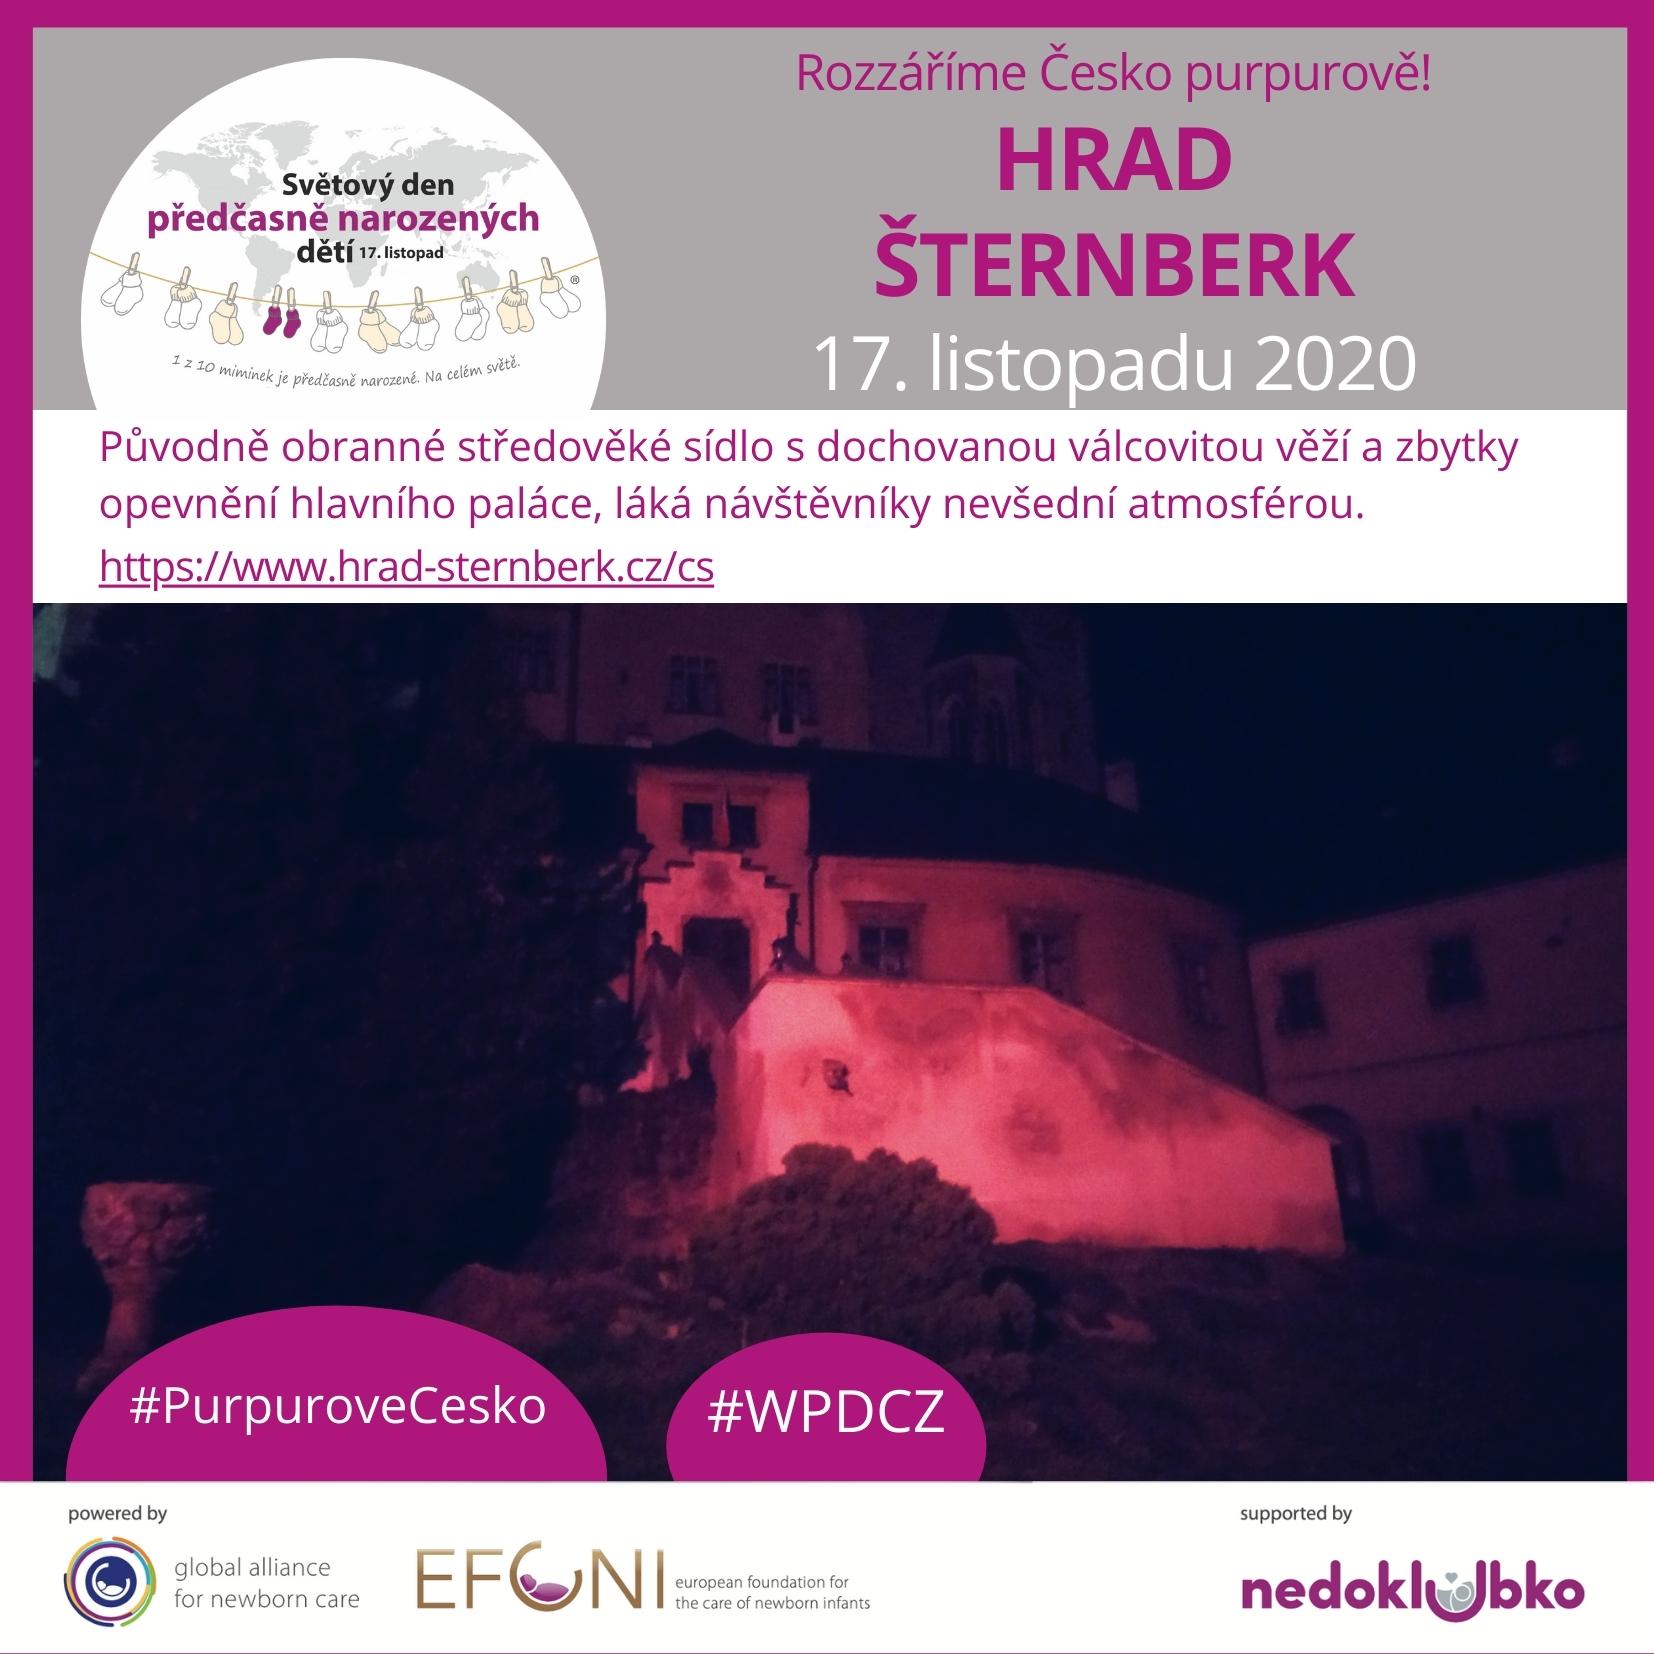 purpuroveCesko_HRAD STERNBERK (1)